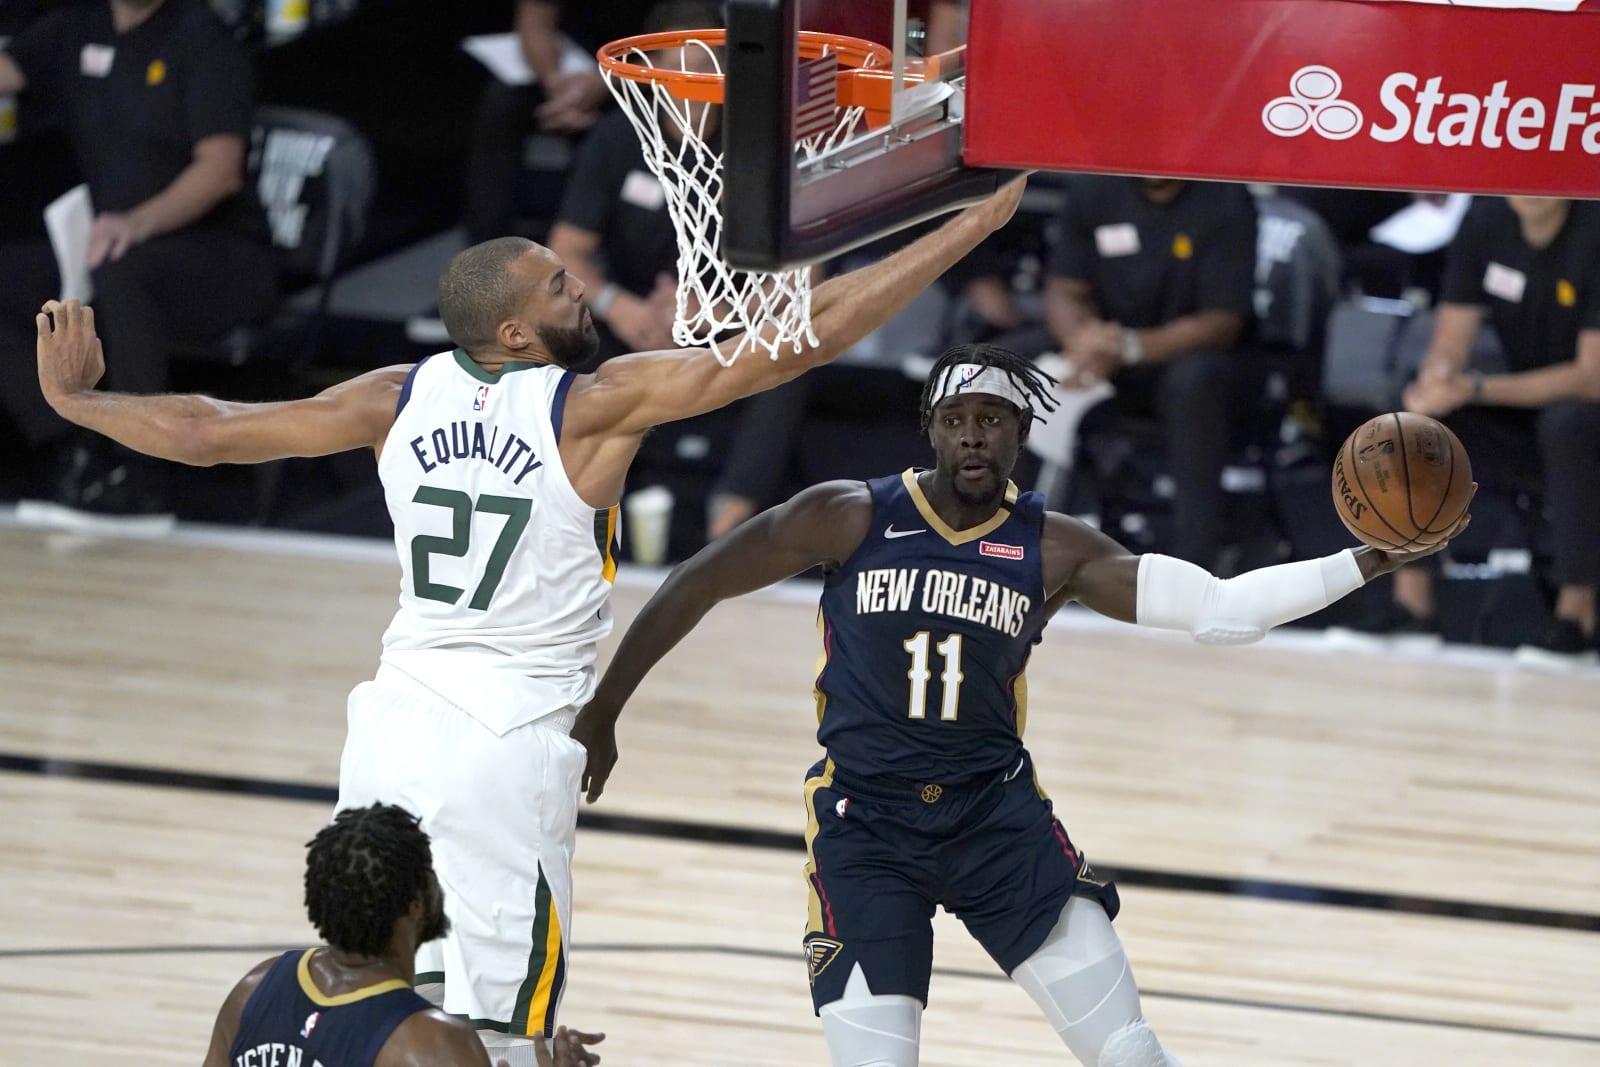 New Orleans Pelicans, Jrue Holiday